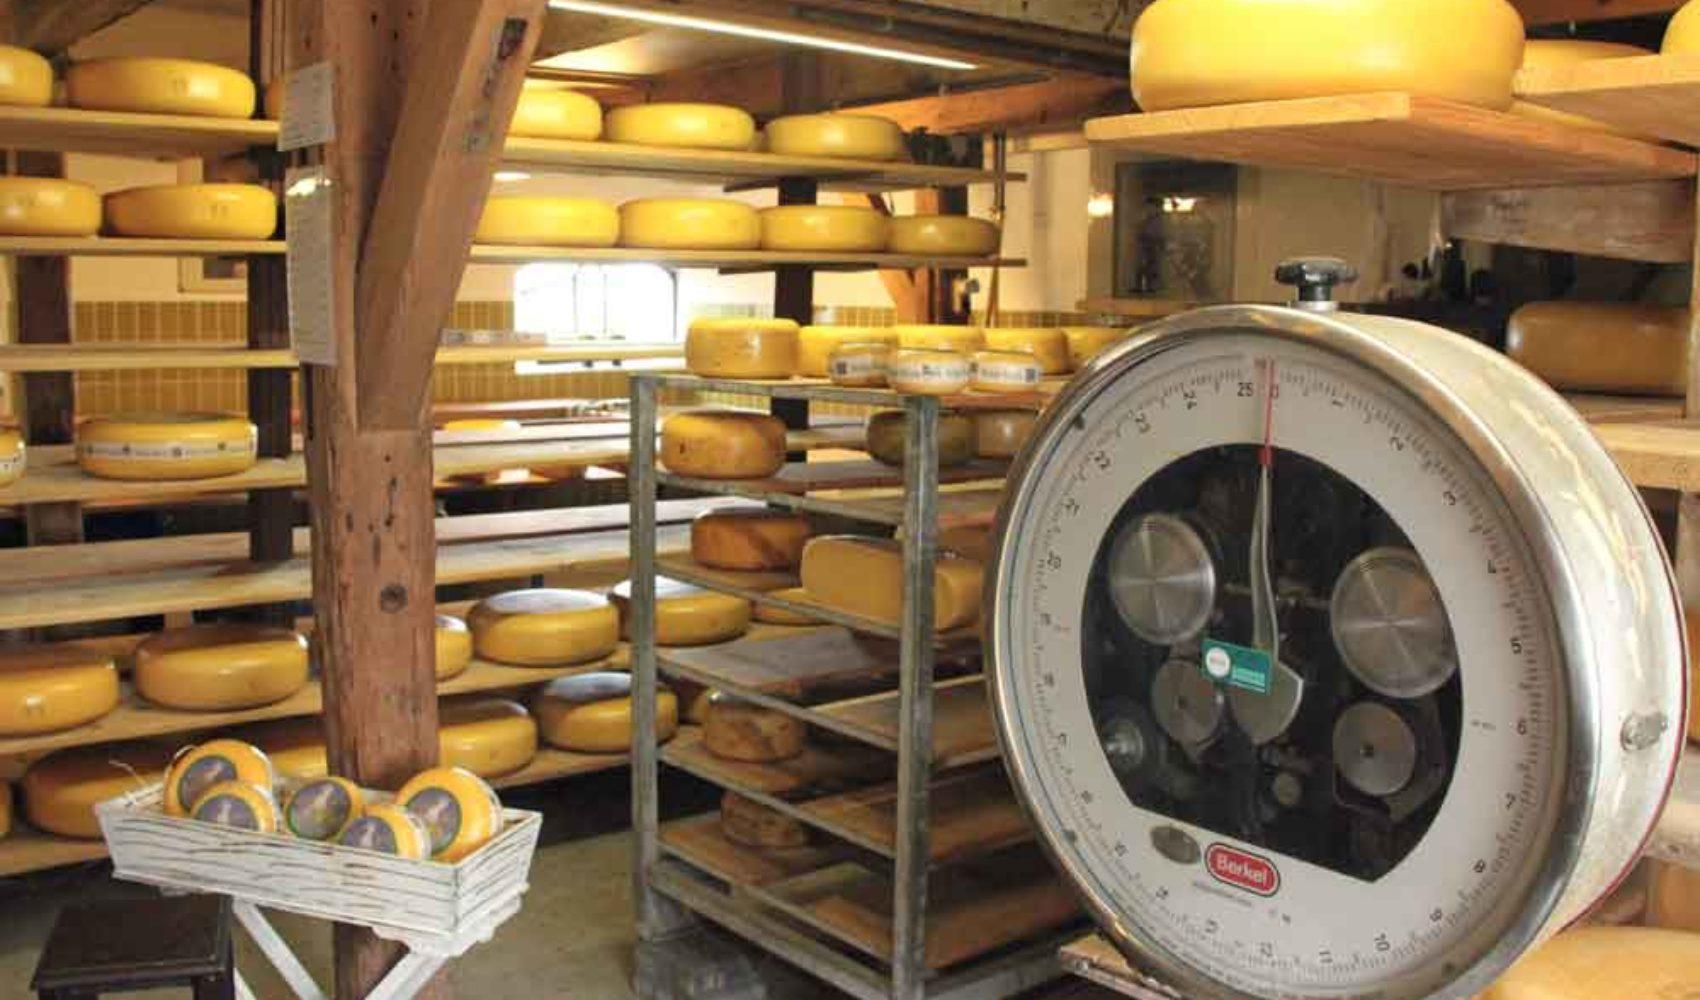 Käse aus Holland - So erkennst du echten Boerenkaas